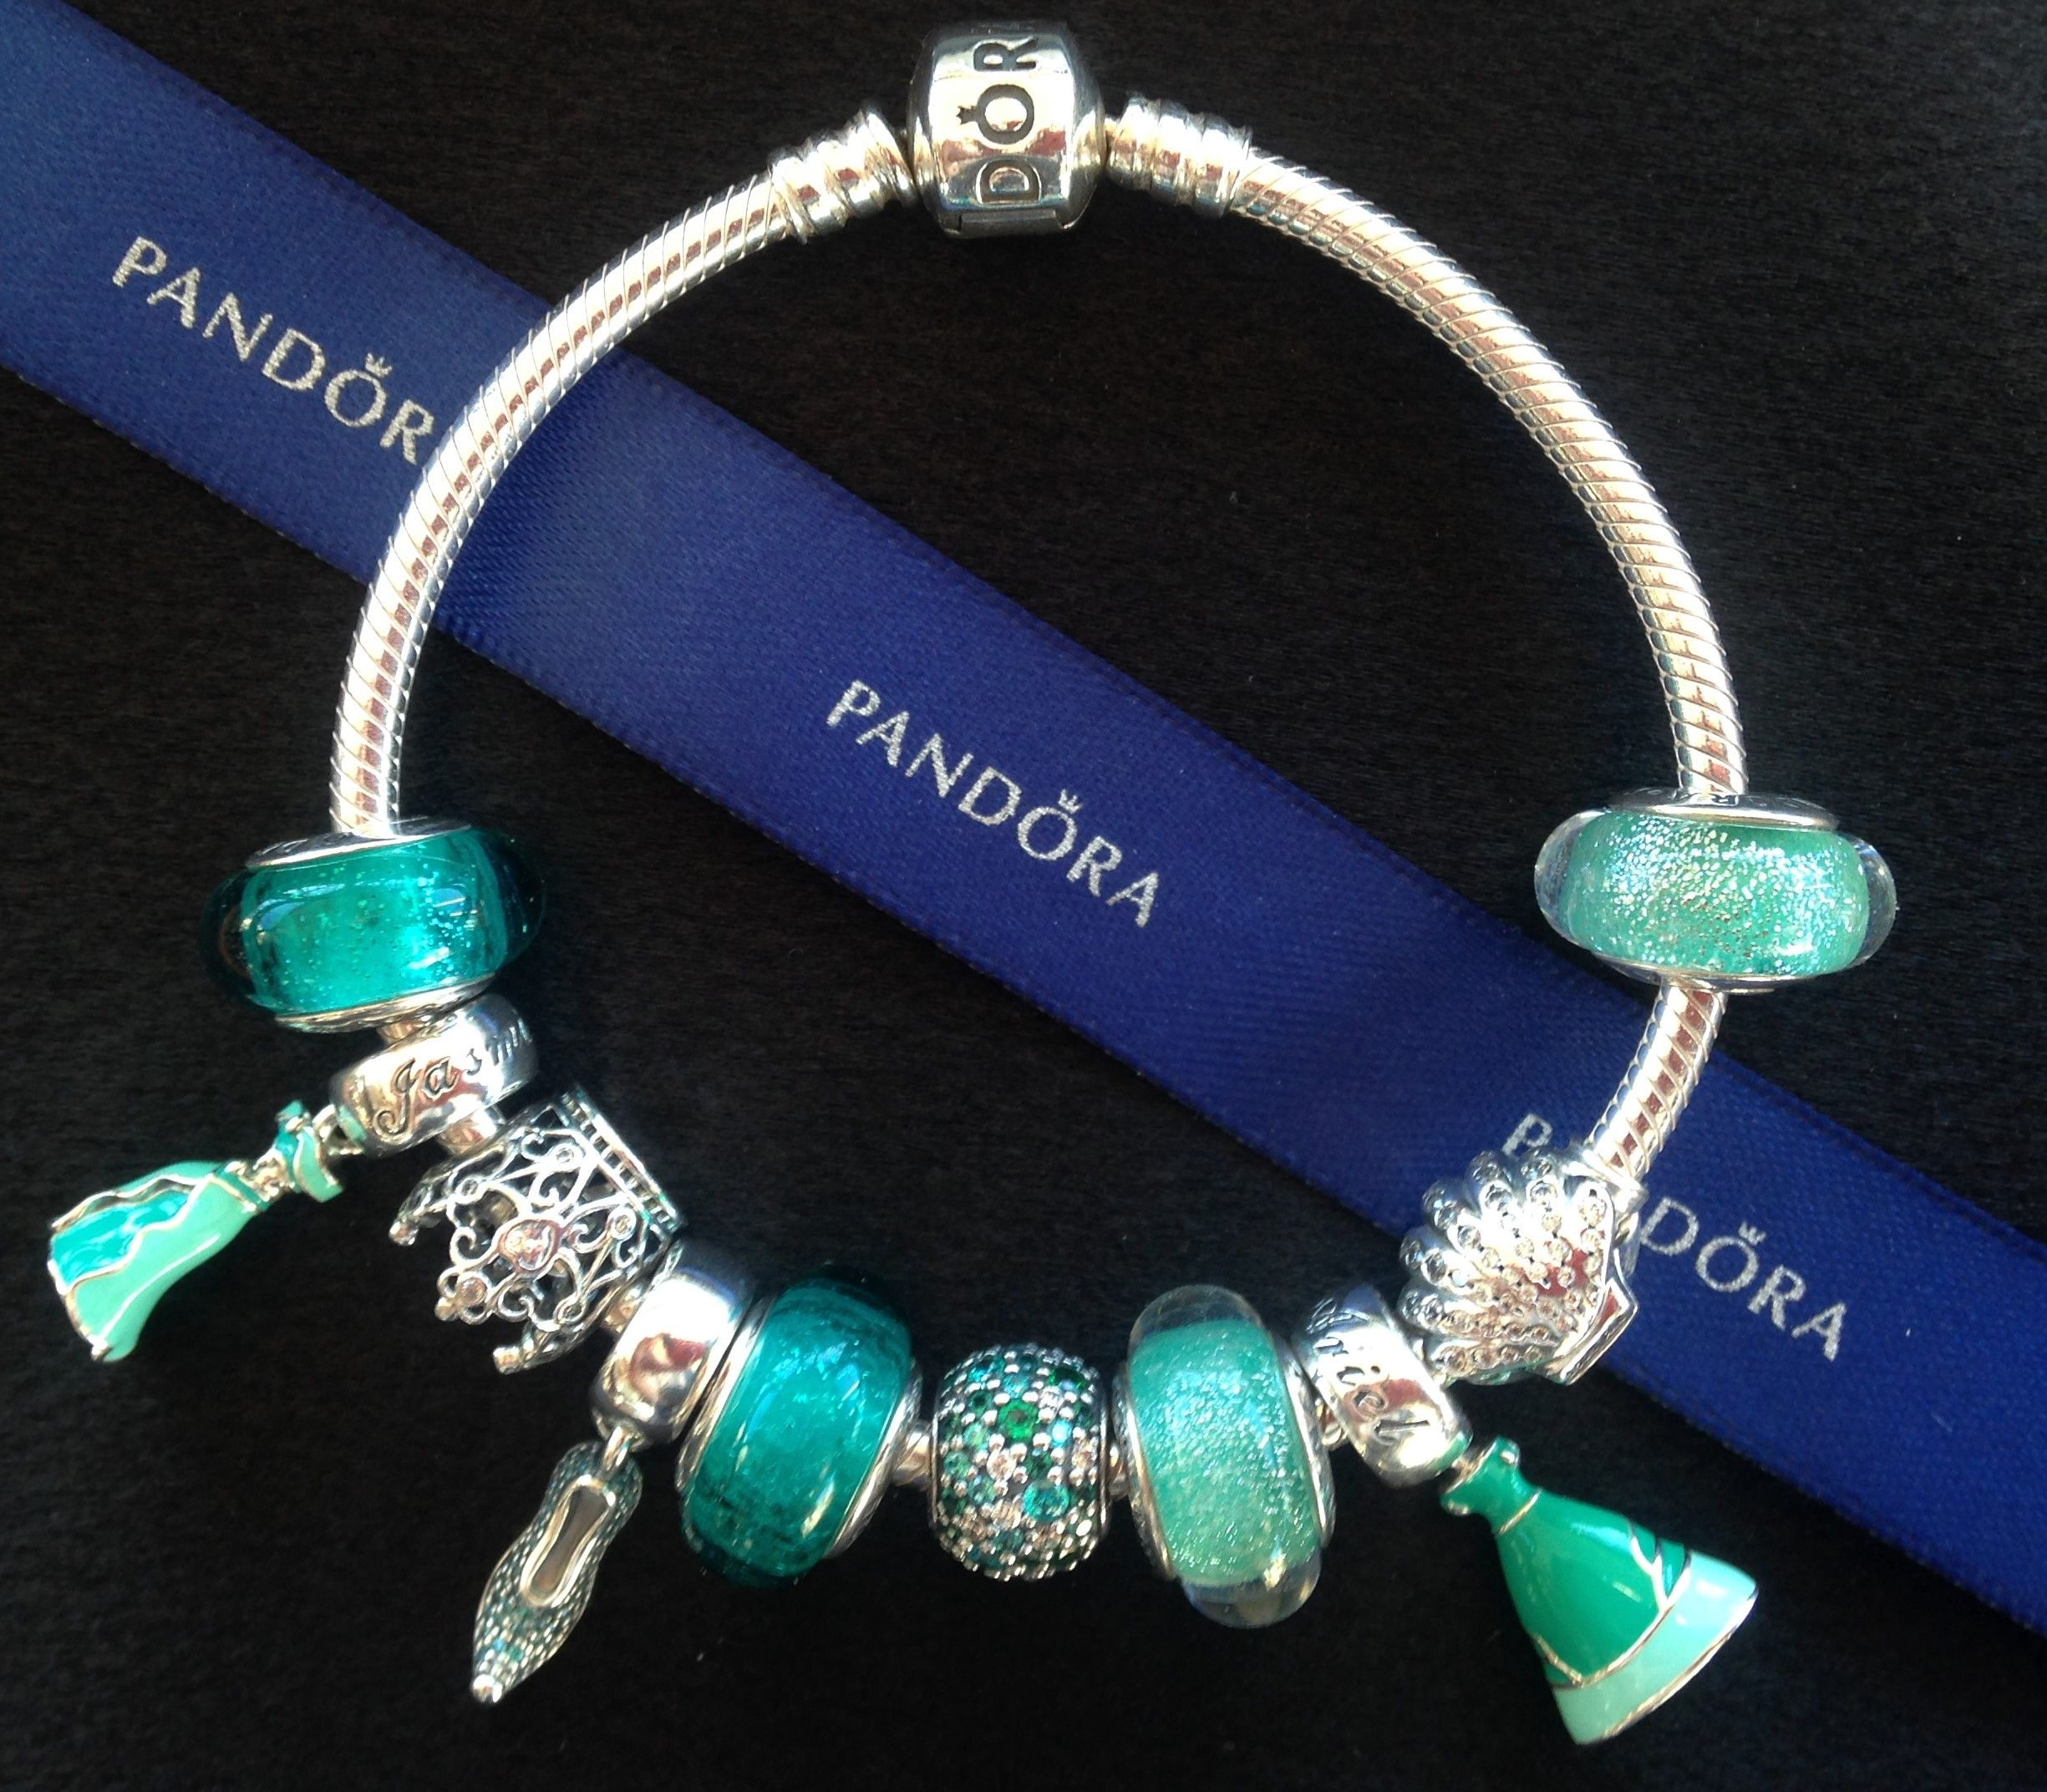 Pandora Disney Jasmine and Ariel charm bracelet